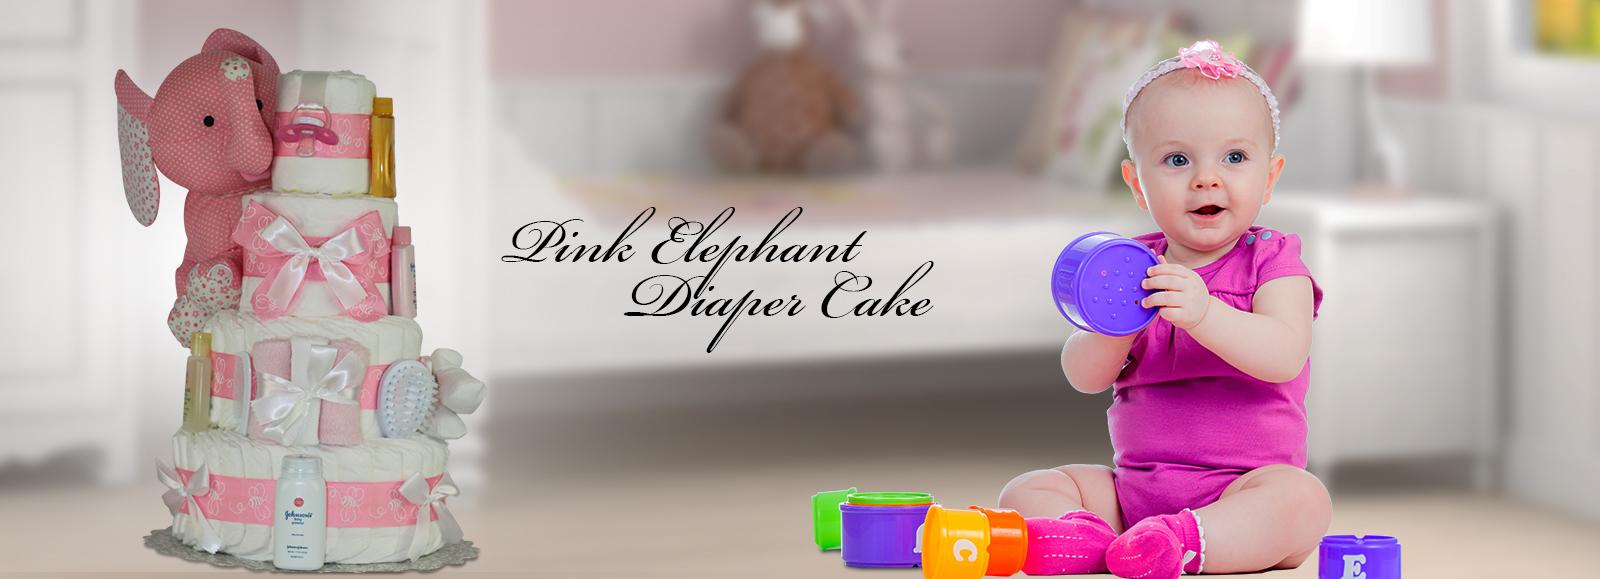 Pink Elephant DiaperCake